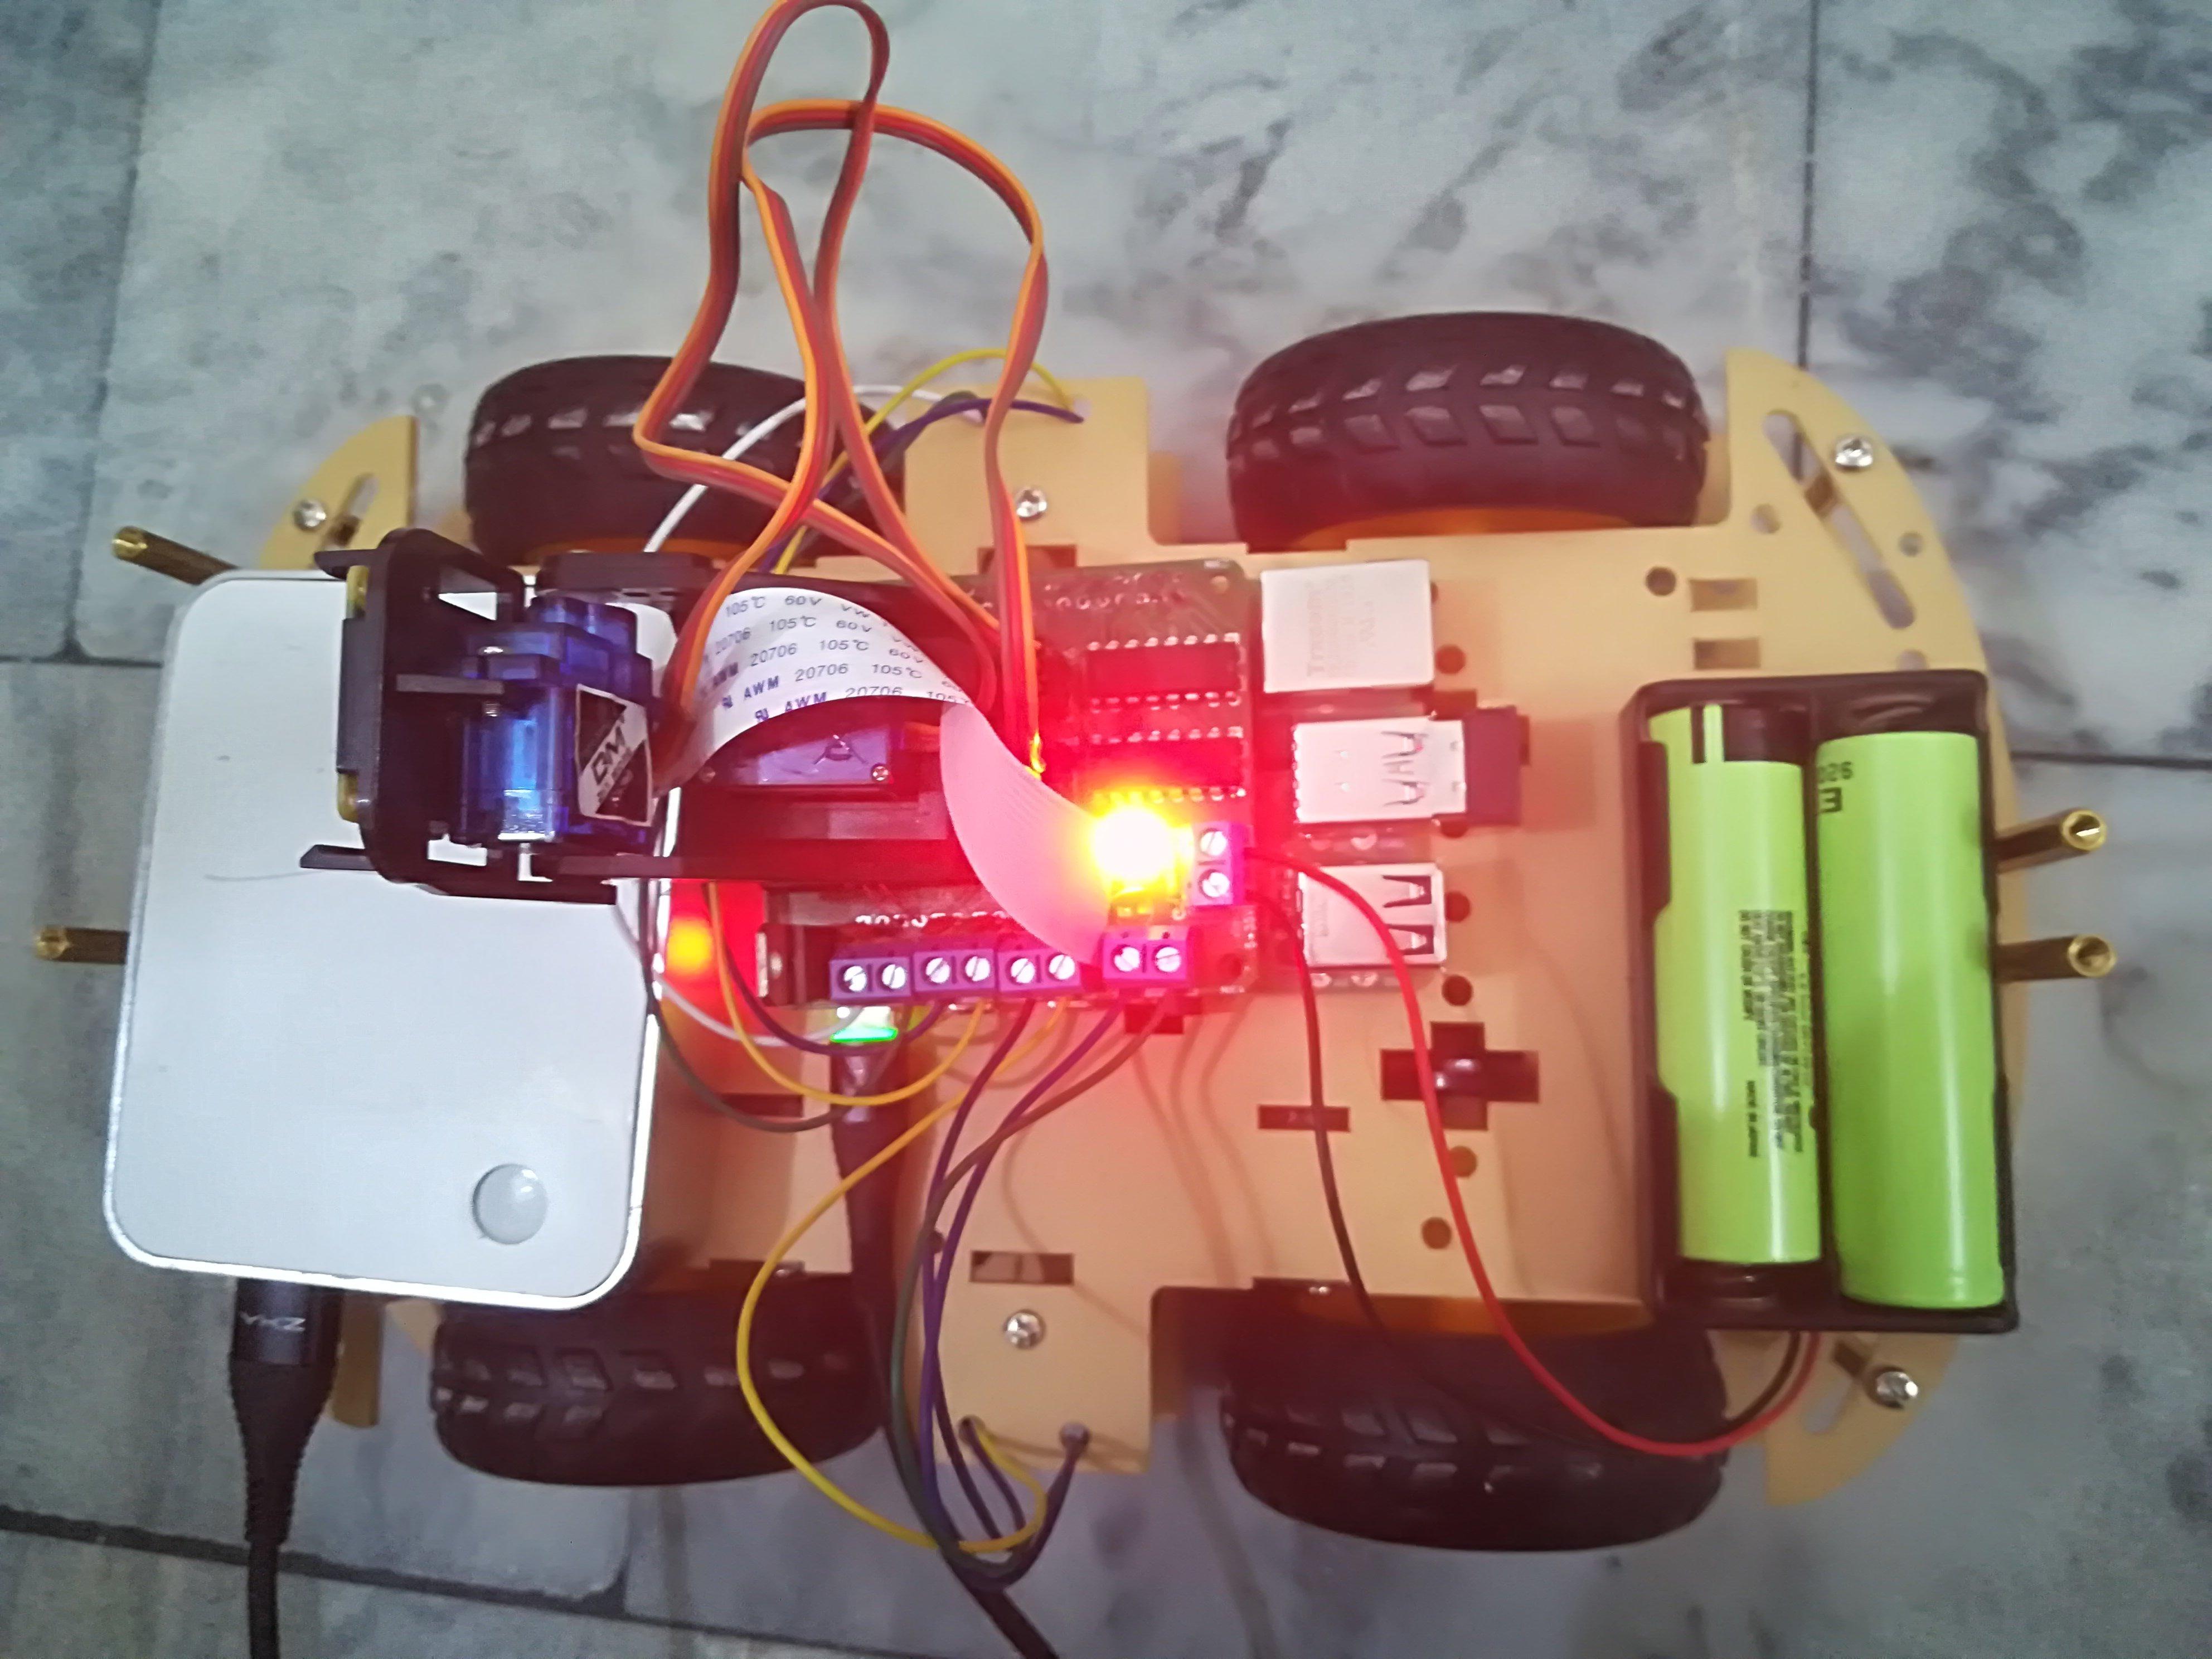 Wireless Video Surveillance Robot using Raspberry Pi 2.jpg